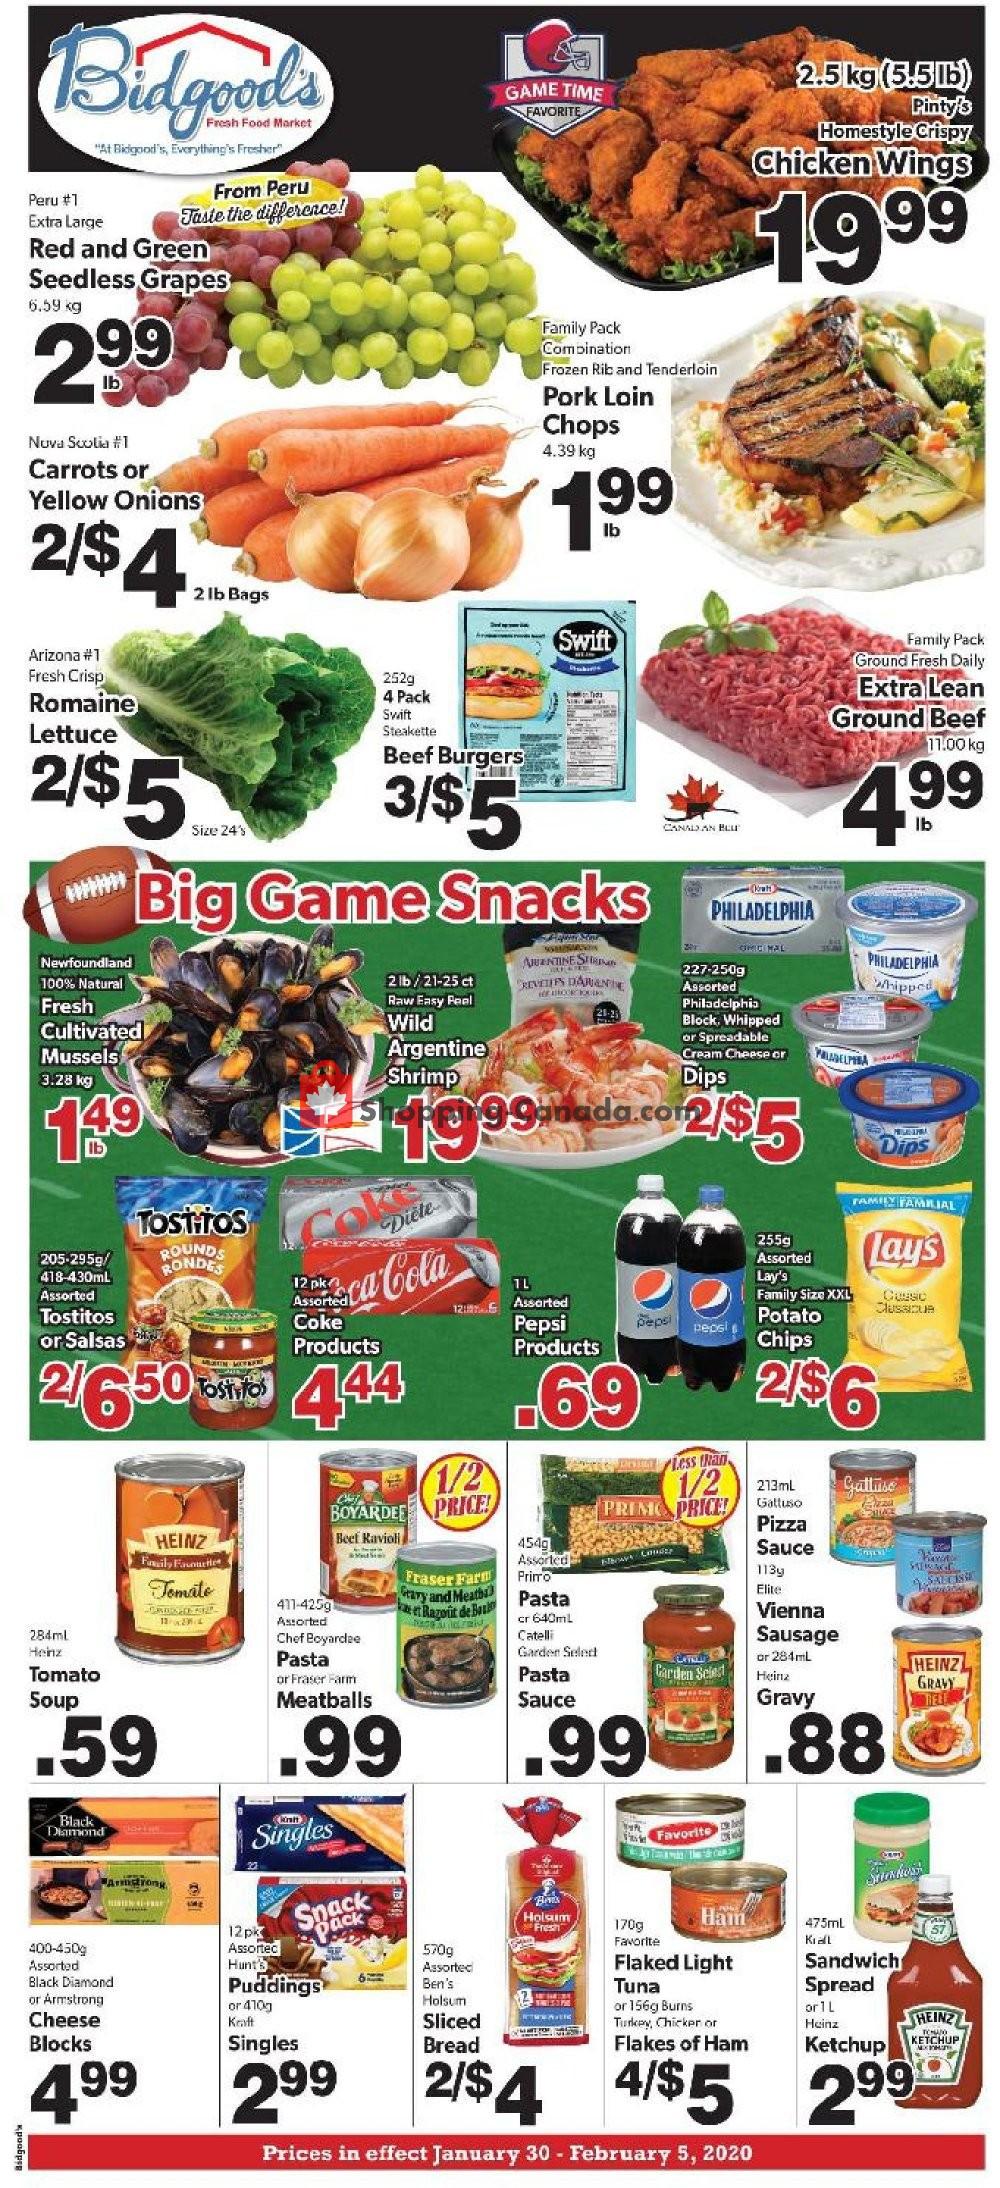 Flyer Bidgood's Supermarket Canada - from Thursday January 30, 2020 to Wednesday February 5, 2020